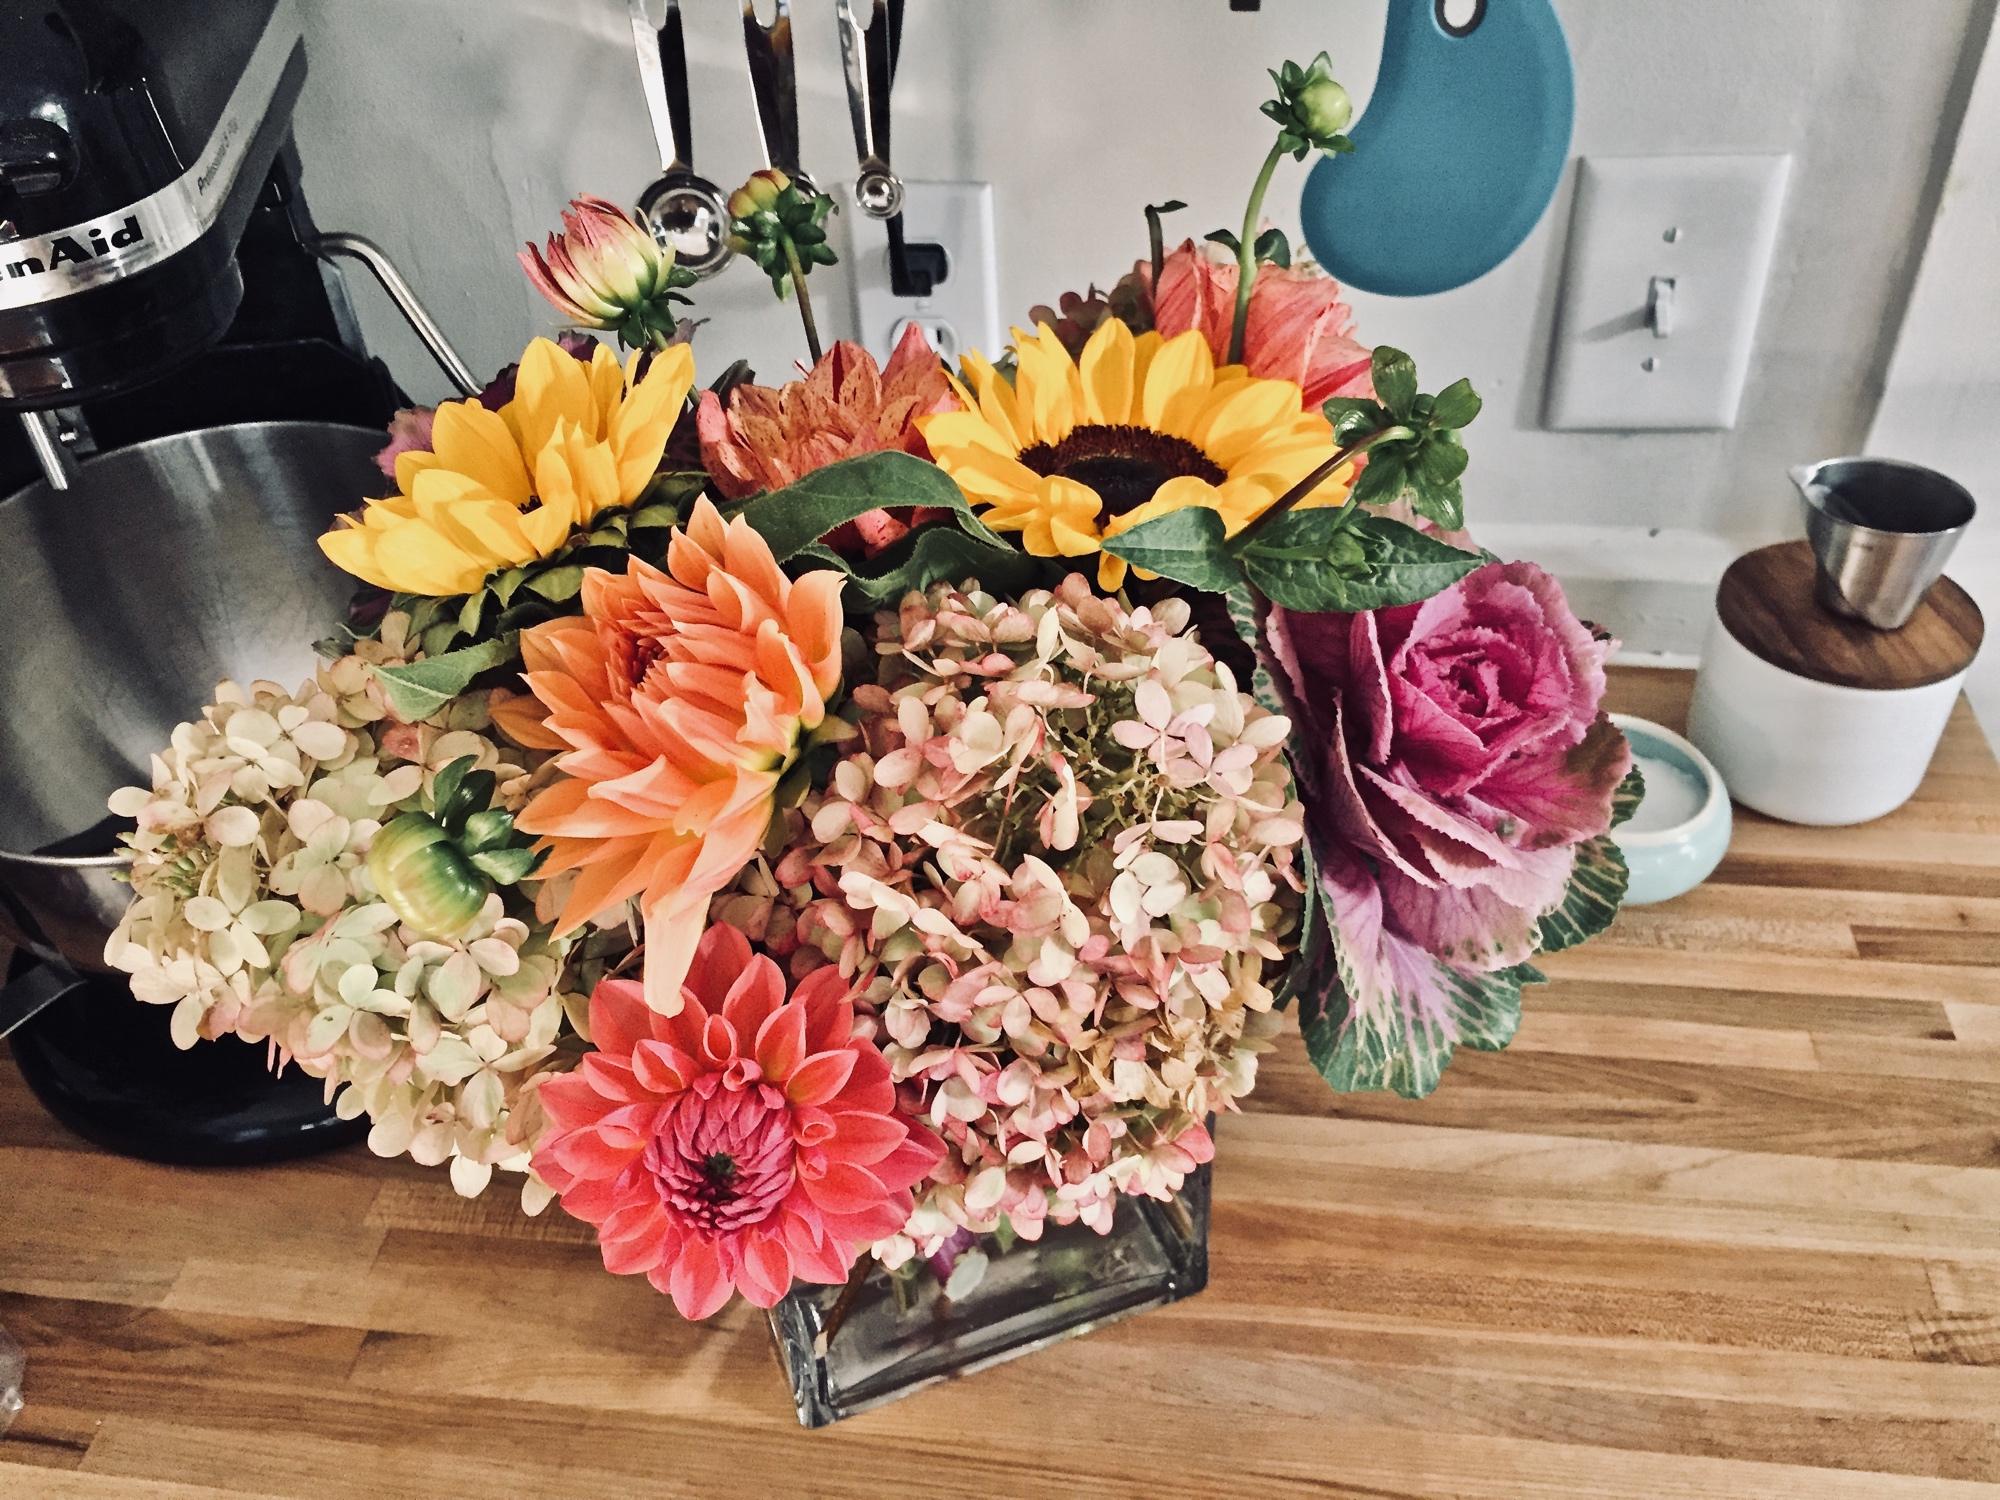 Floral arrangement by Jephry Floral Studio Photo by Barbra Revill